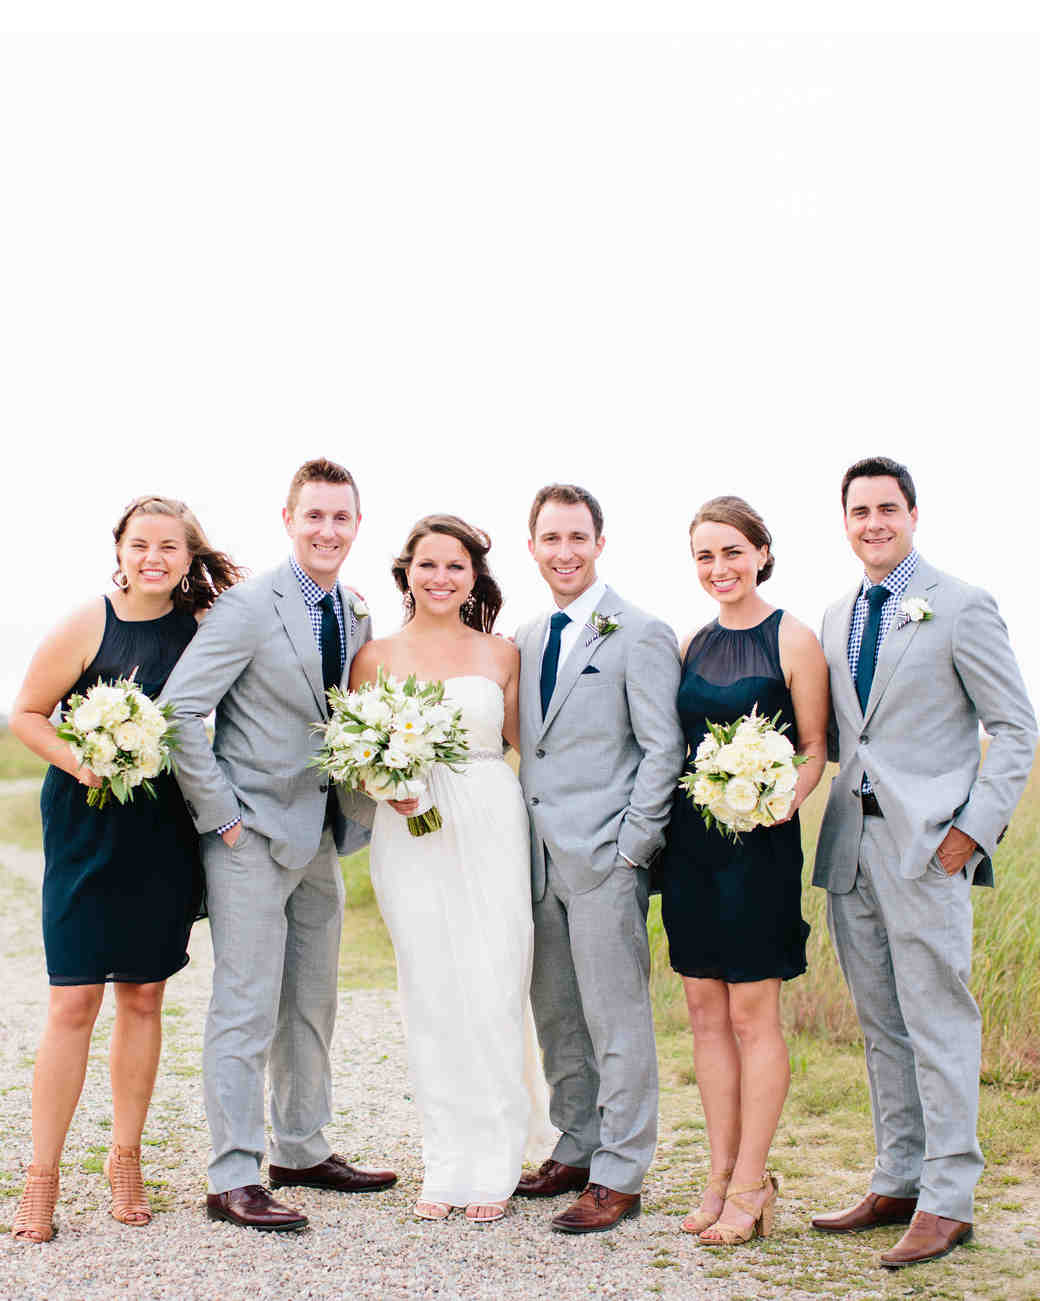 kristen-jonathan-wedding-bridalparty-1345-s112193-1015.jpg